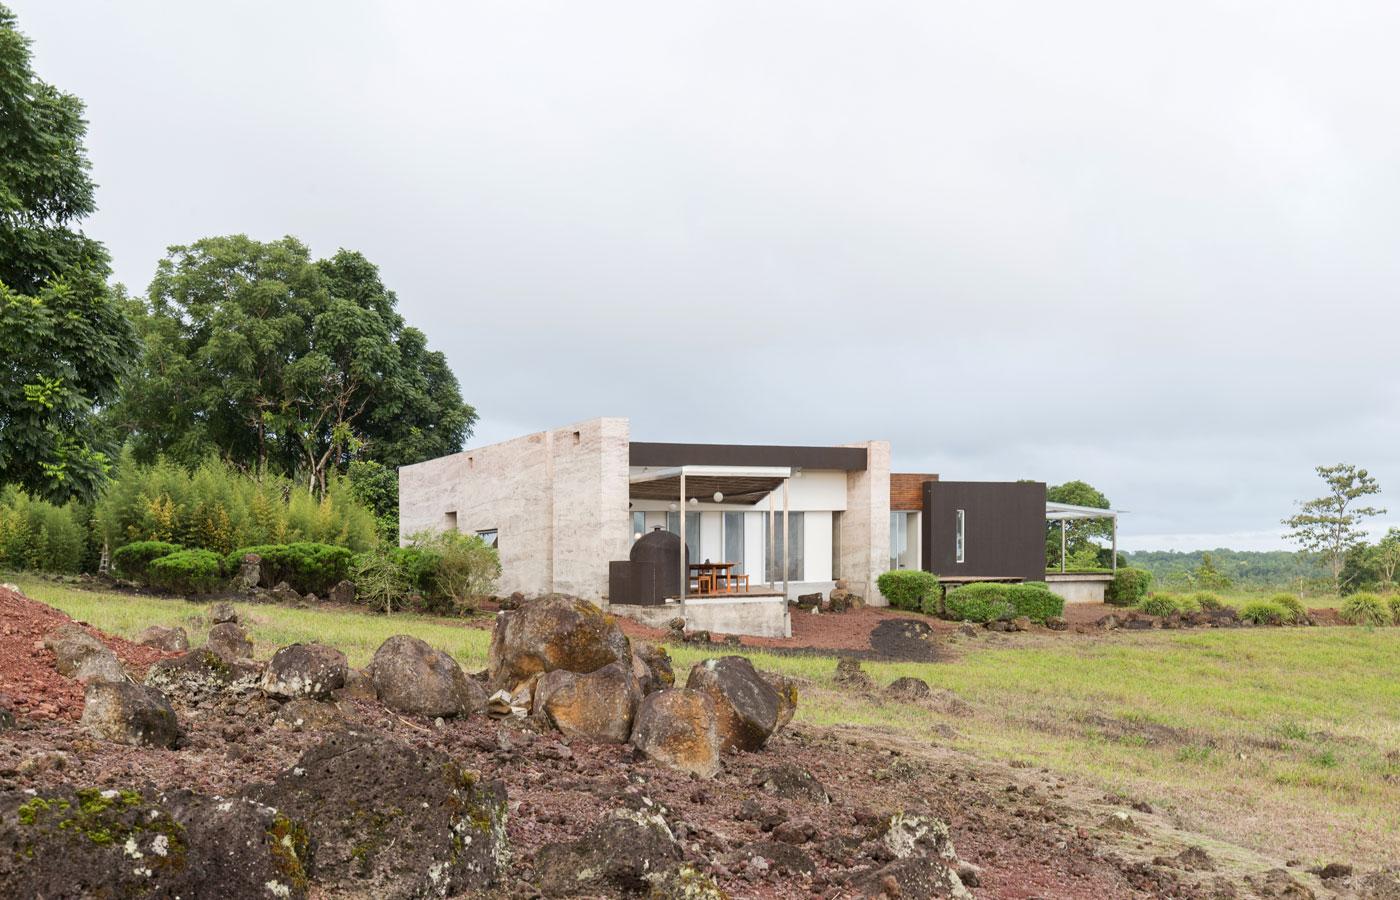 Montemar Eco Luxury Villas, luxury Galapagos hotels. luxury Galapagos boats, Galapagos cruise, luxury Galapagos cruise